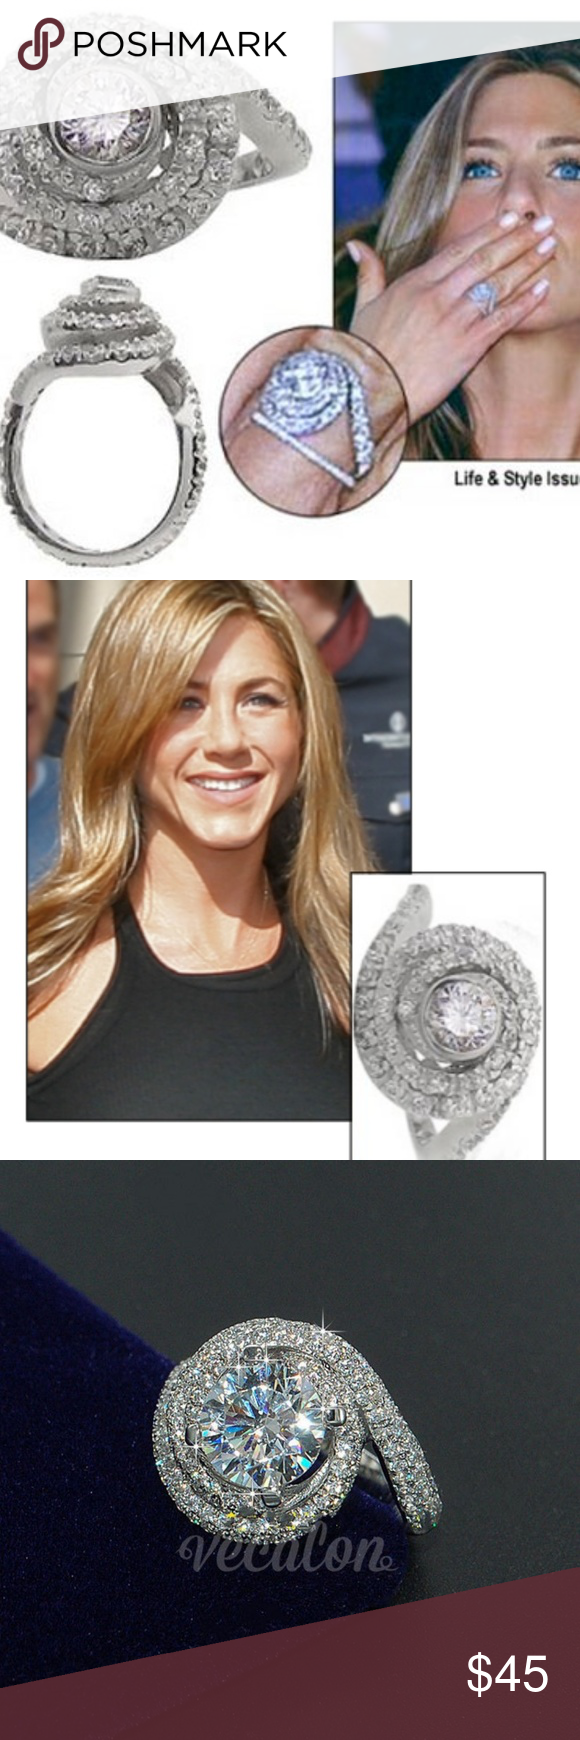 Jennifer Aniston Wedding Ring With Brad Pitt In 2021 Jennifer Aniston Wedding Ring Celebrity Wedding Rings Gorgeous Wedding Rings